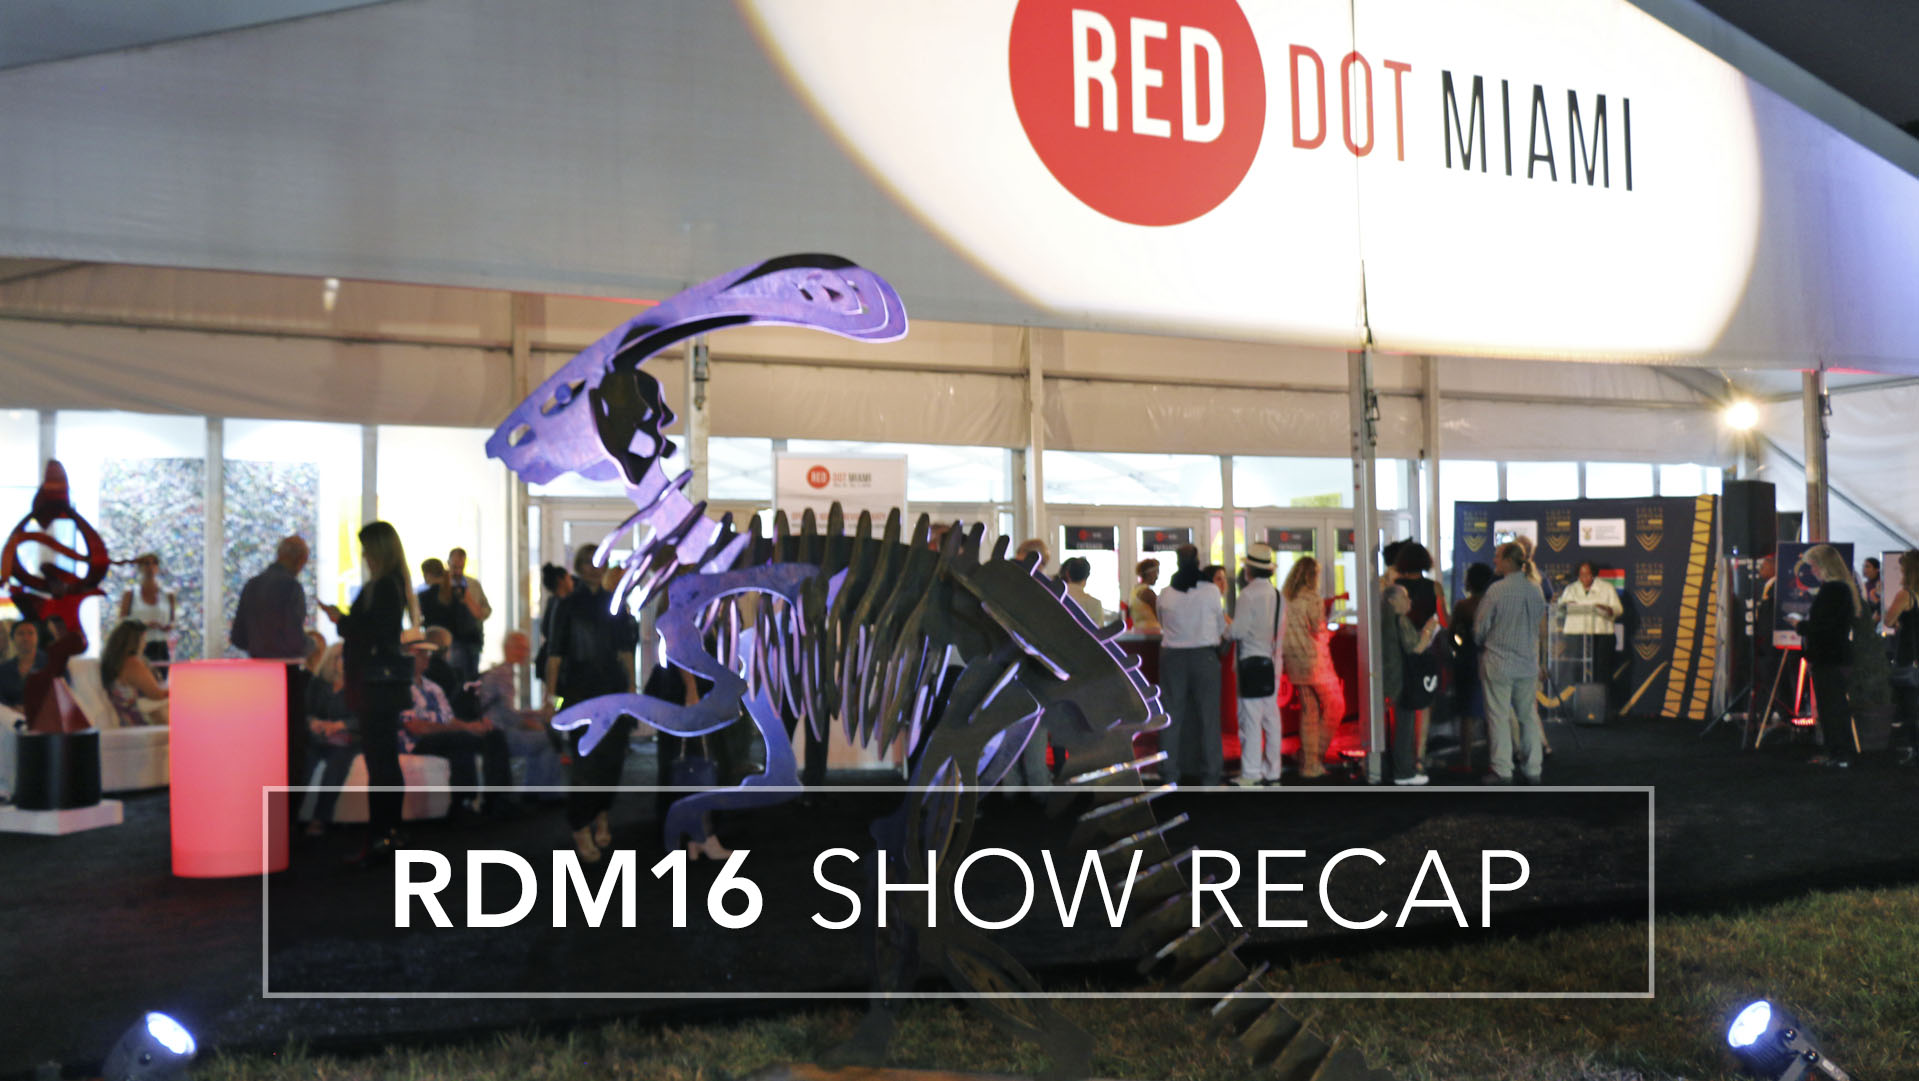 Red Dot Miami 2016 Show Recap